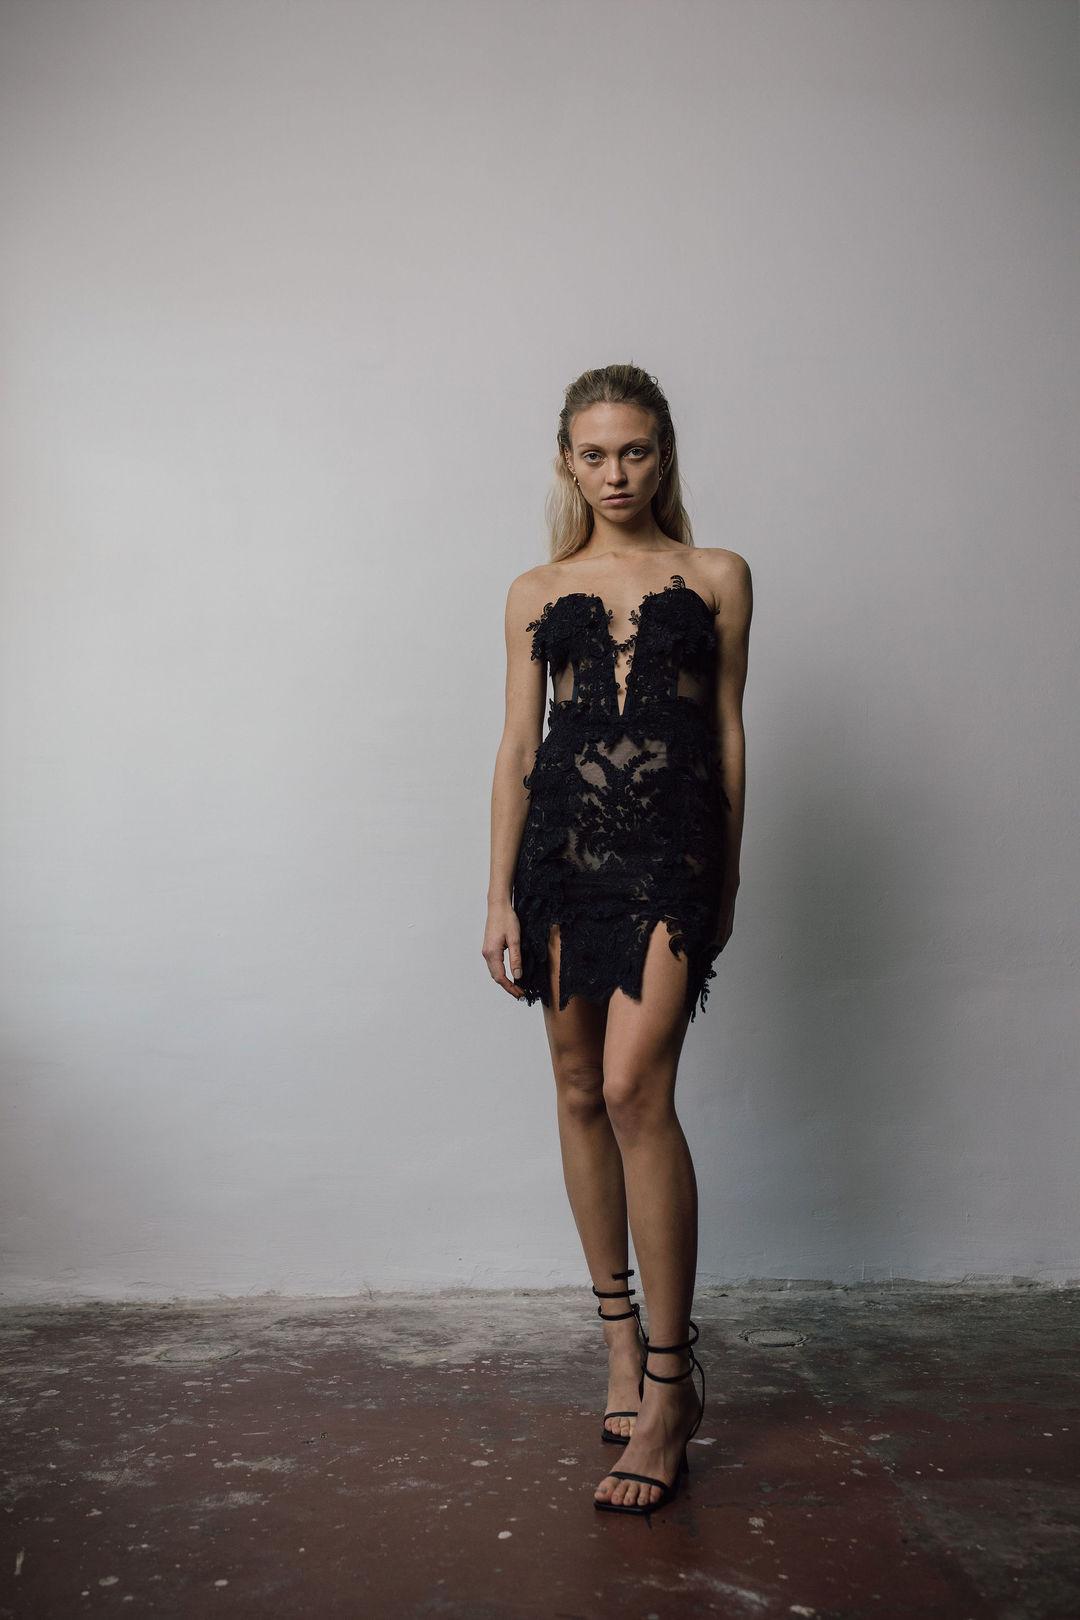 sly dress dress photo